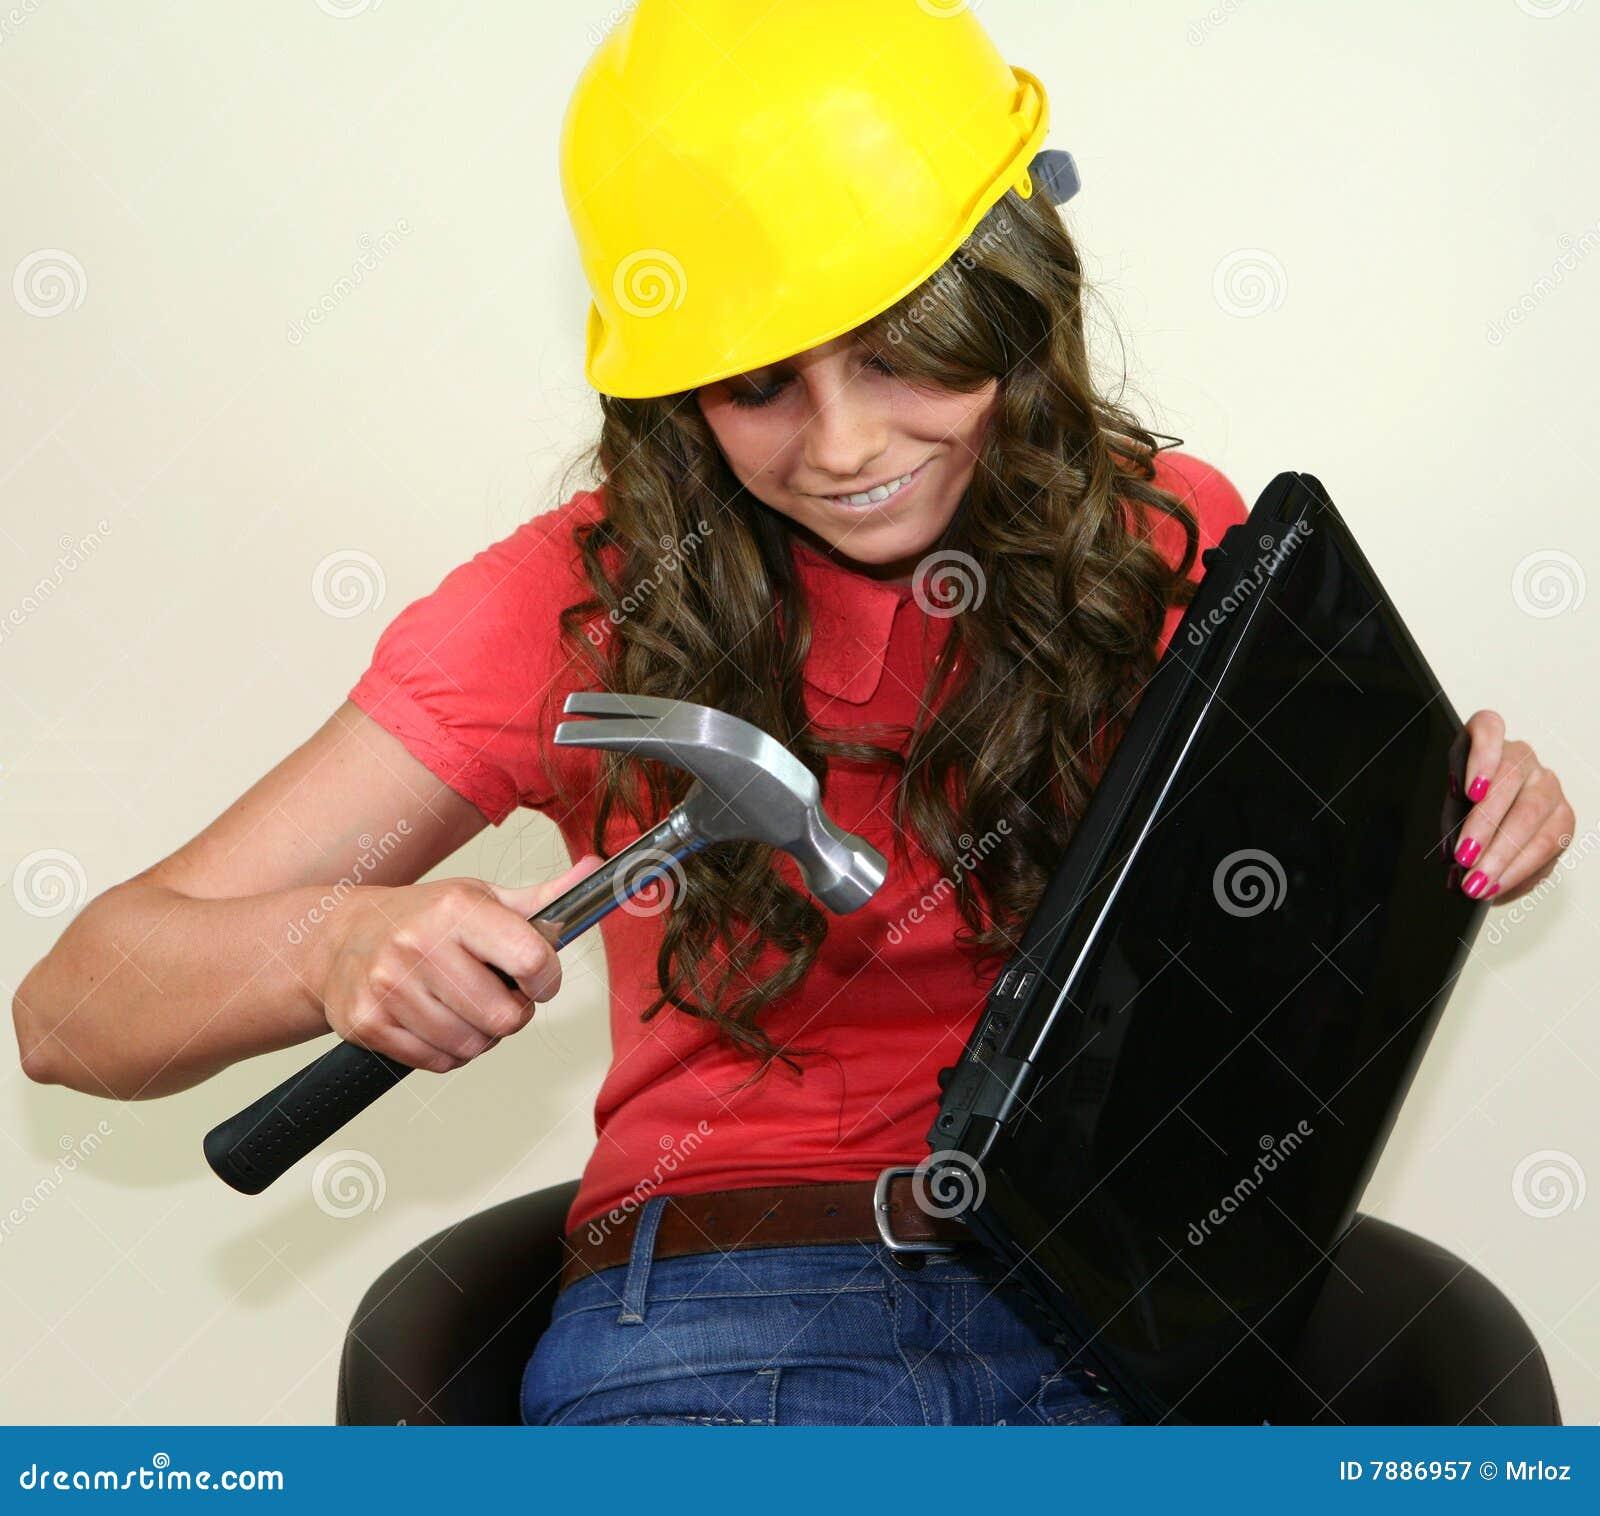 Fixing the Laptop